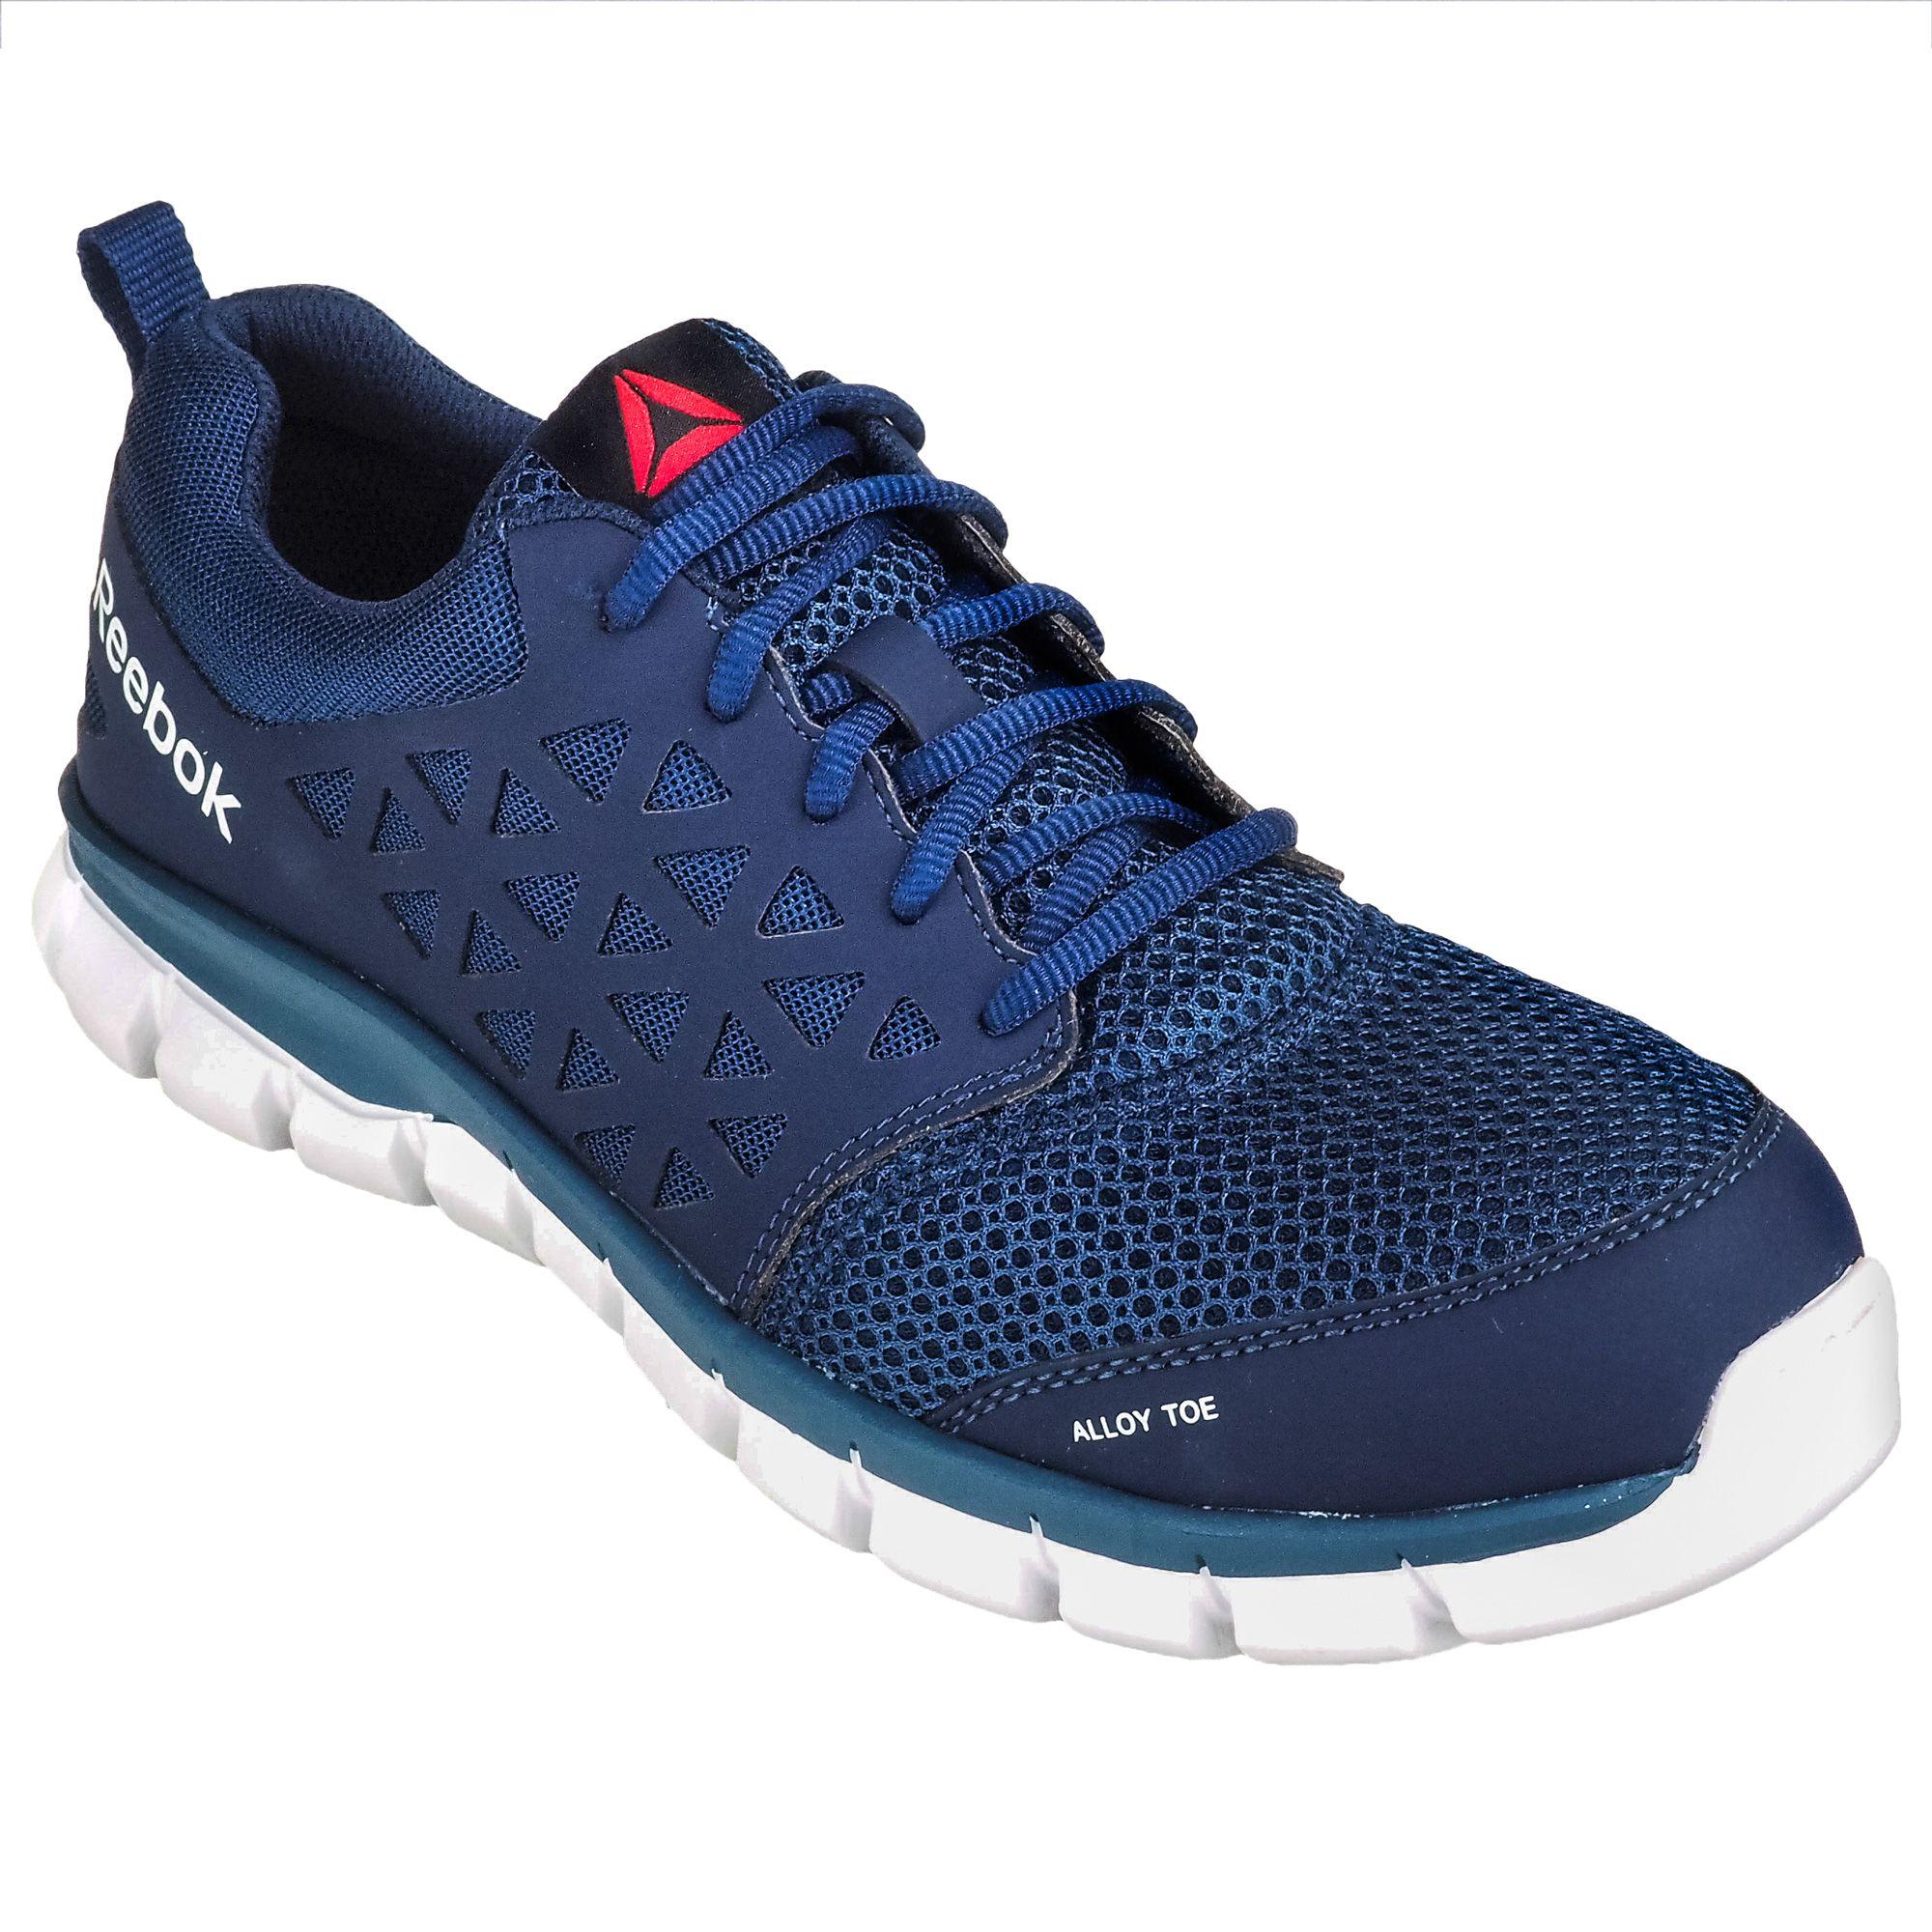 Reebok Men s Alloy Toe ESD RB4043 Sublite Cushion Blue Athletic Shoes d8f6aec65